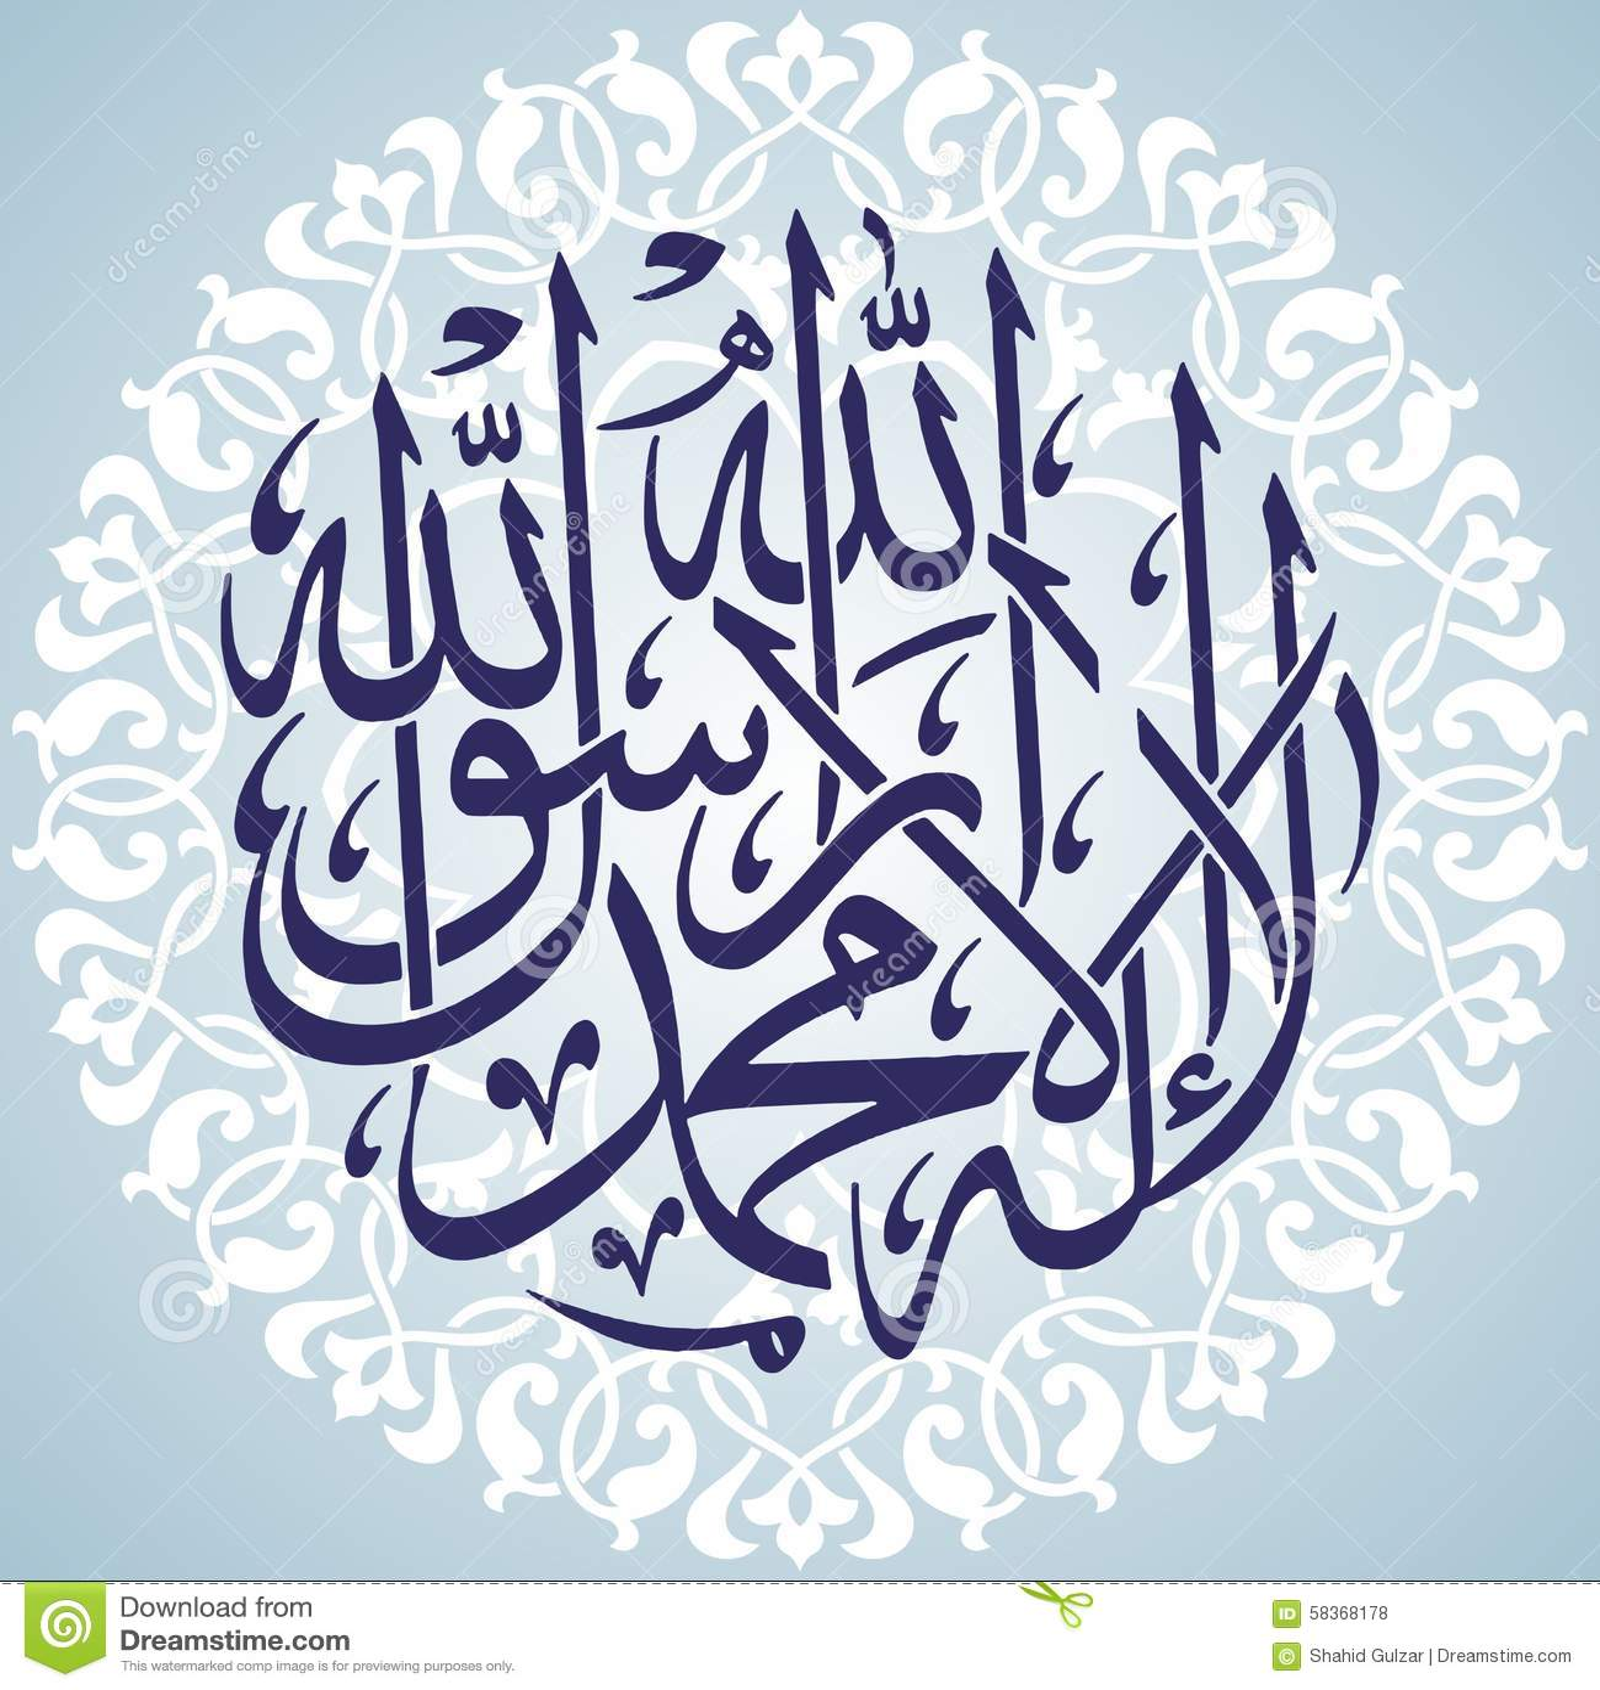 Islamic Calligraphy Wallpaper Poster Kate Naskh Kalma Stock